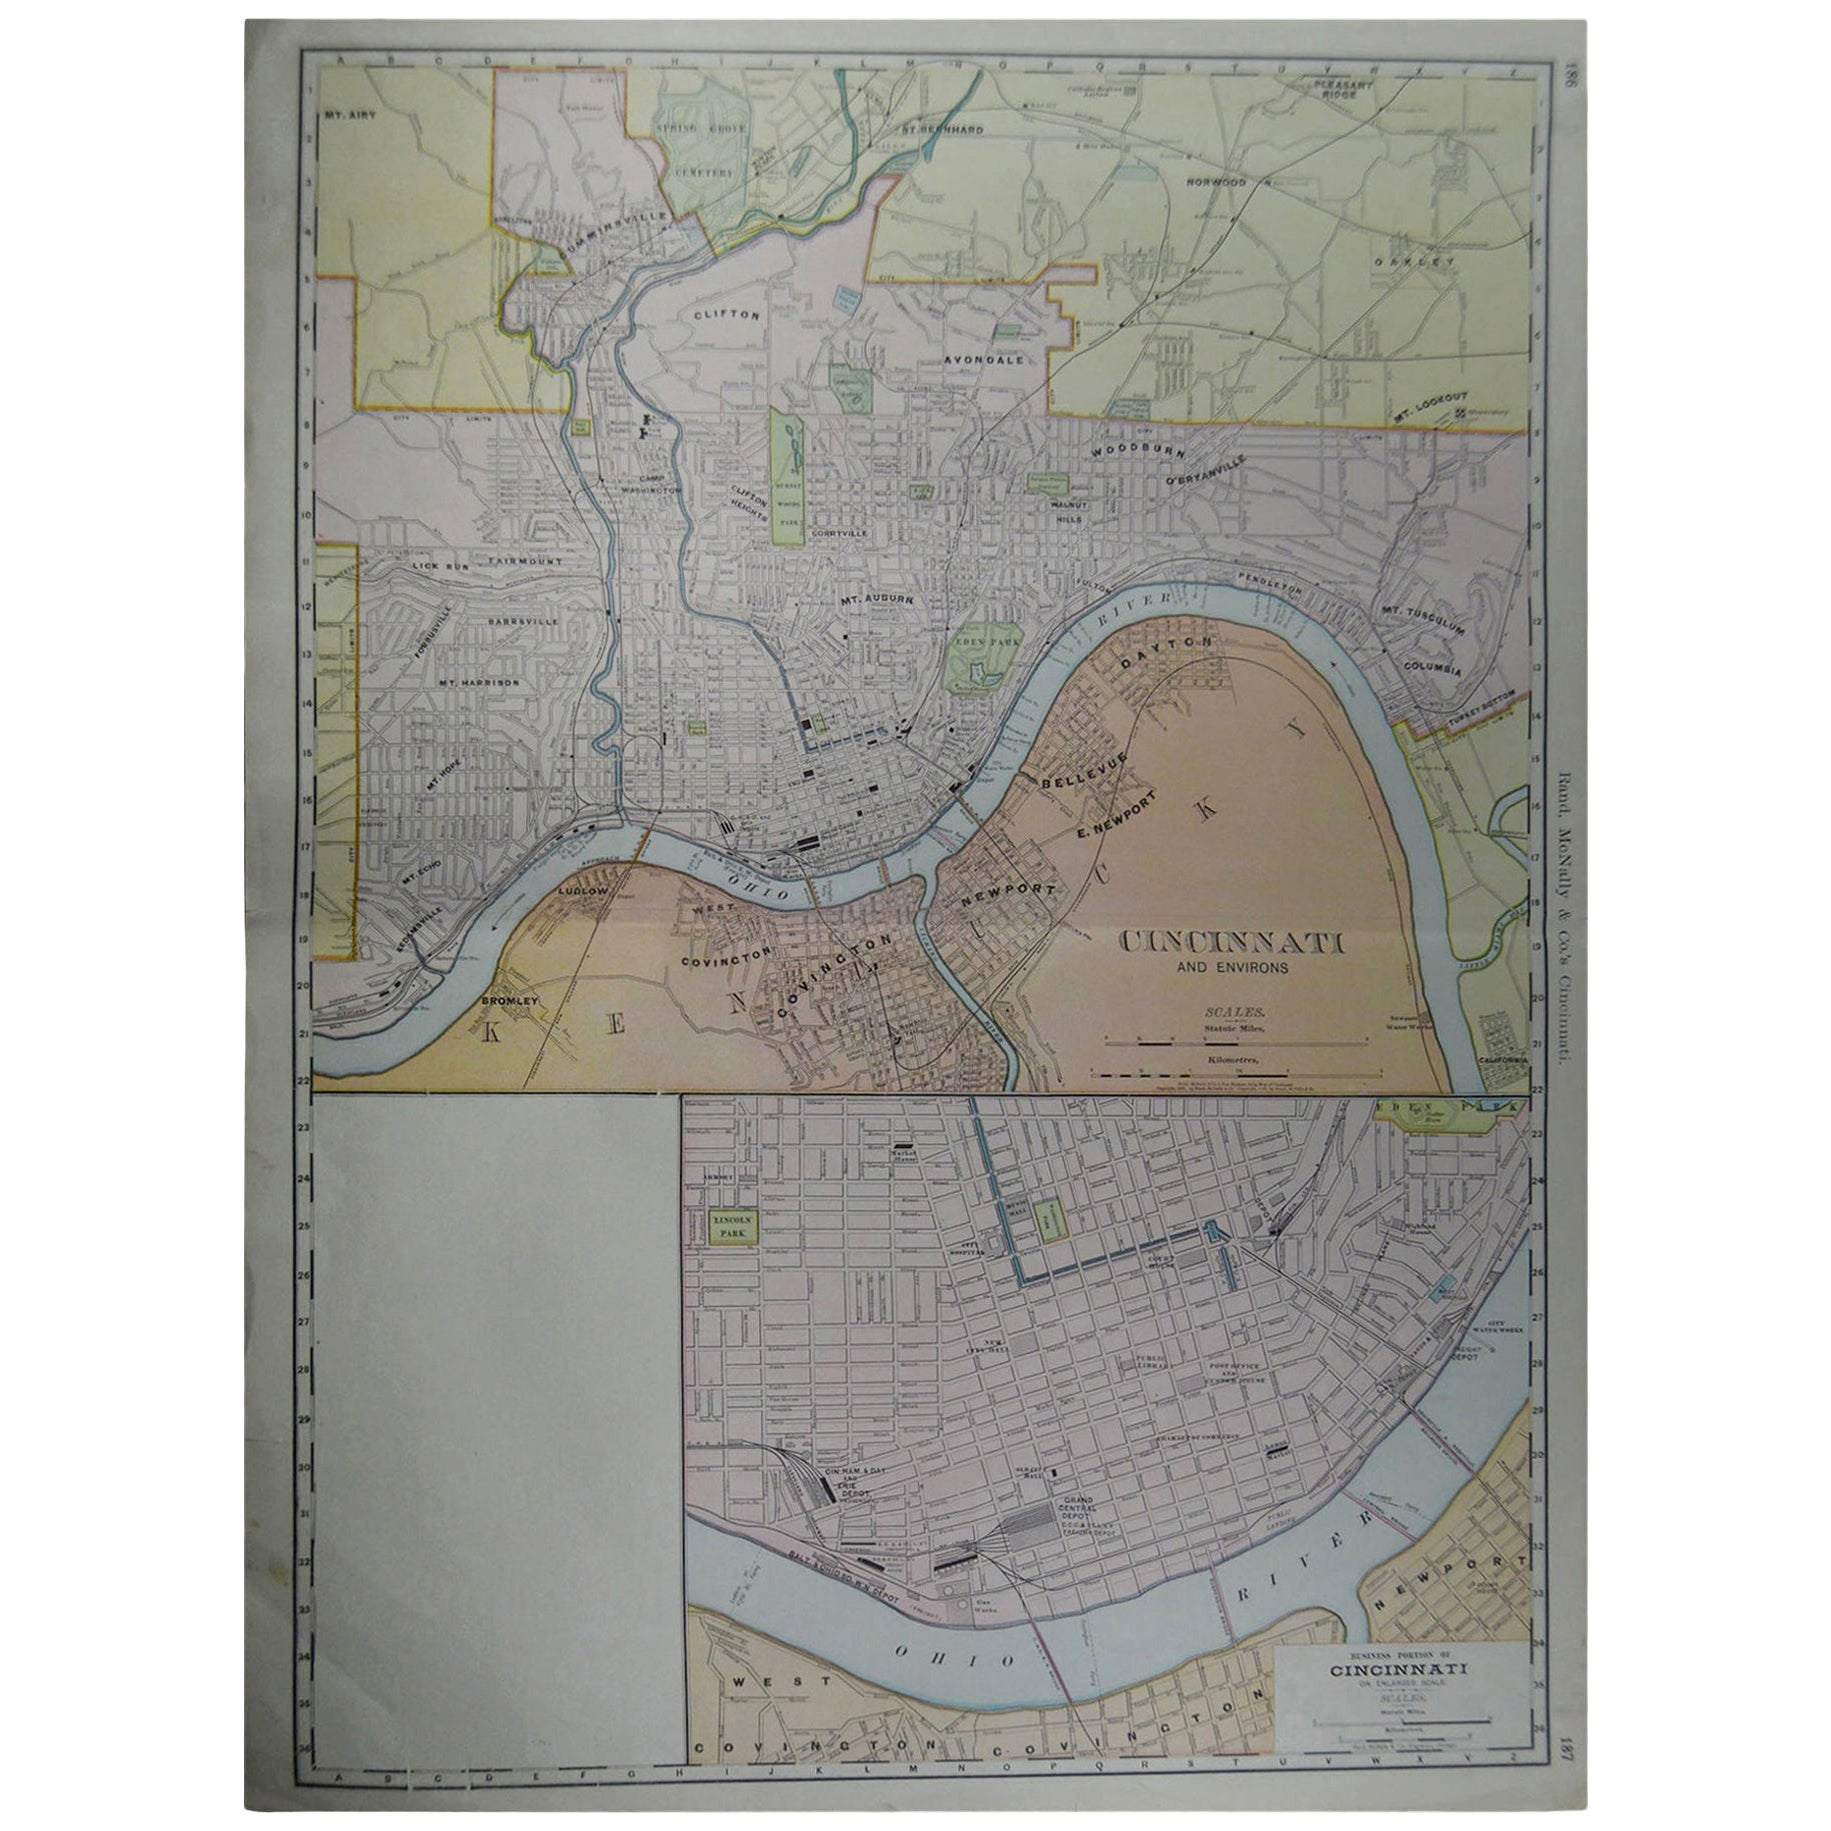 Large Original Antique City Plan of Cincinnati, USA, circa 1900